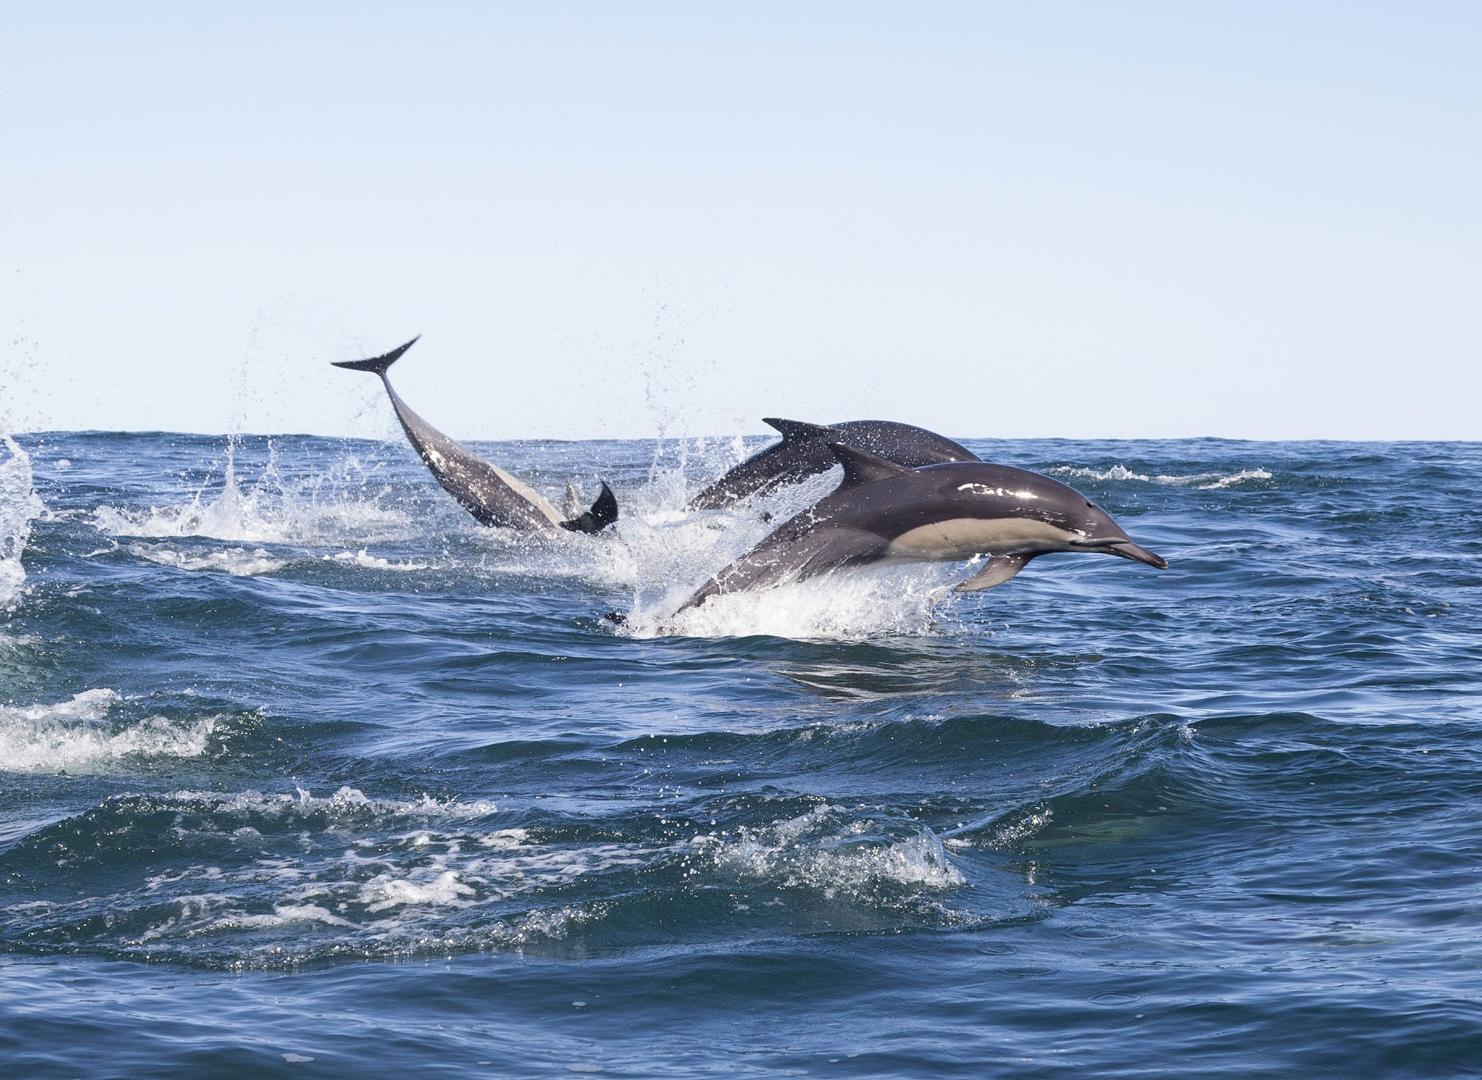 nws-st-south-africa-sardine-run-dolphins.jpg